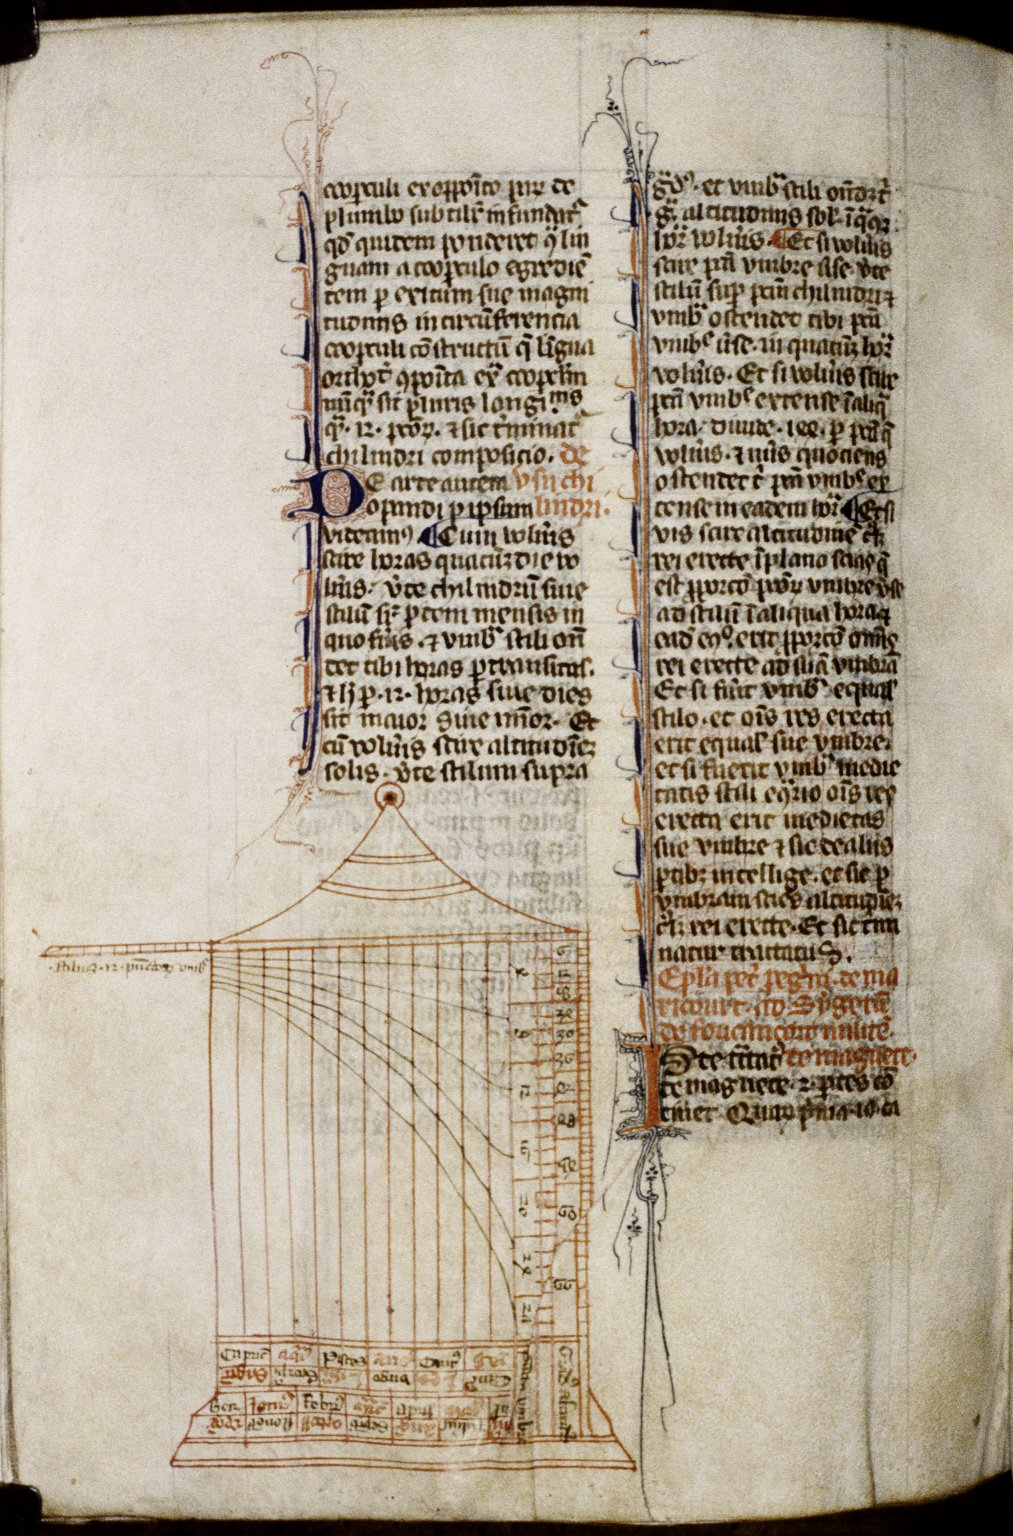 """BOD, MS Ashmole 1522, f. 181v."""